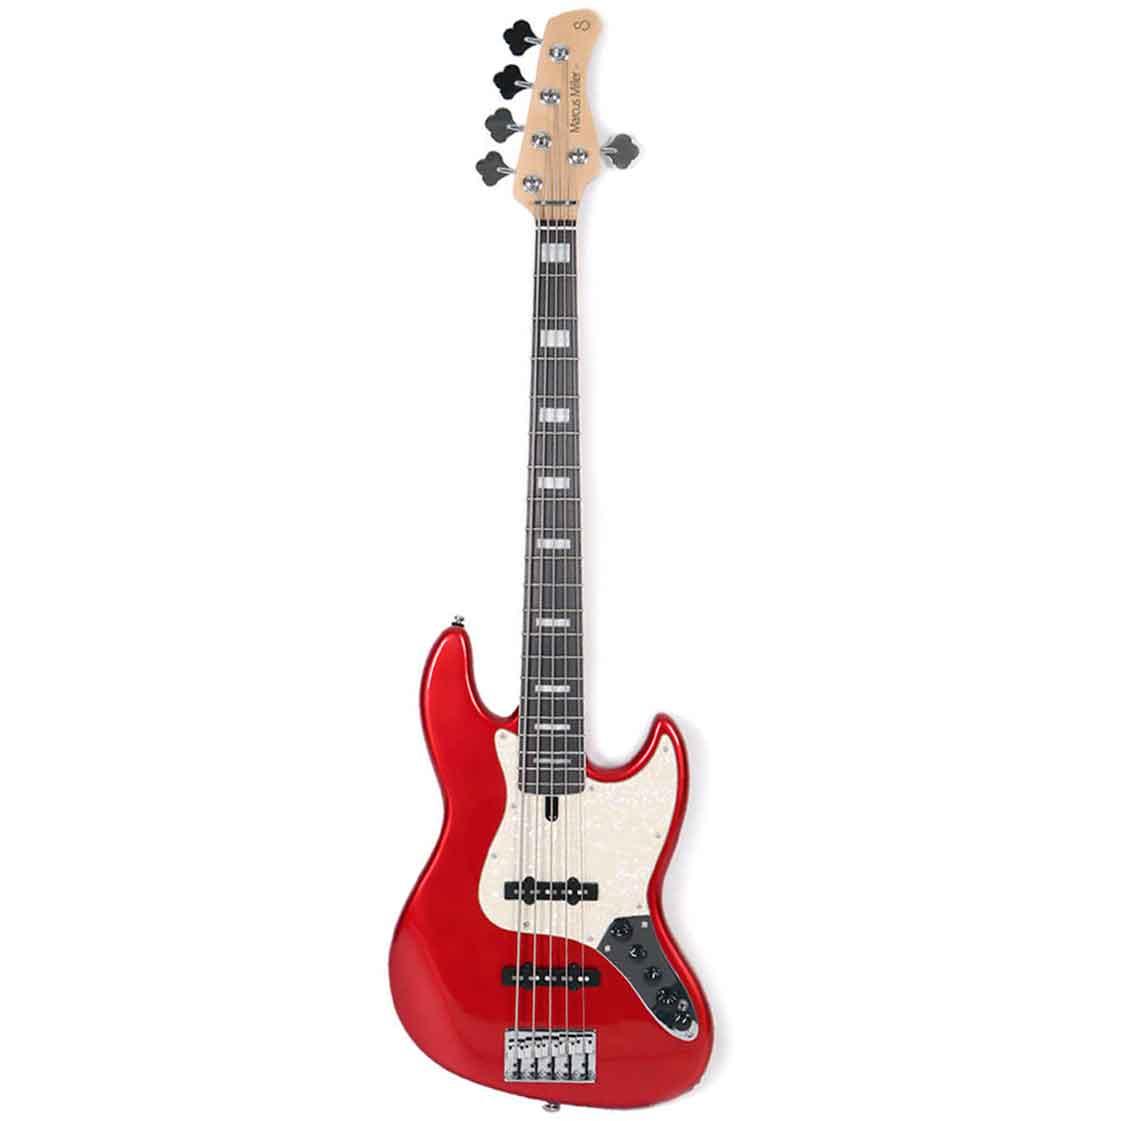 Sire Marcus Miller V7 ALDER-5 BMR el-bas, 5-strenget Bright Metallic Red